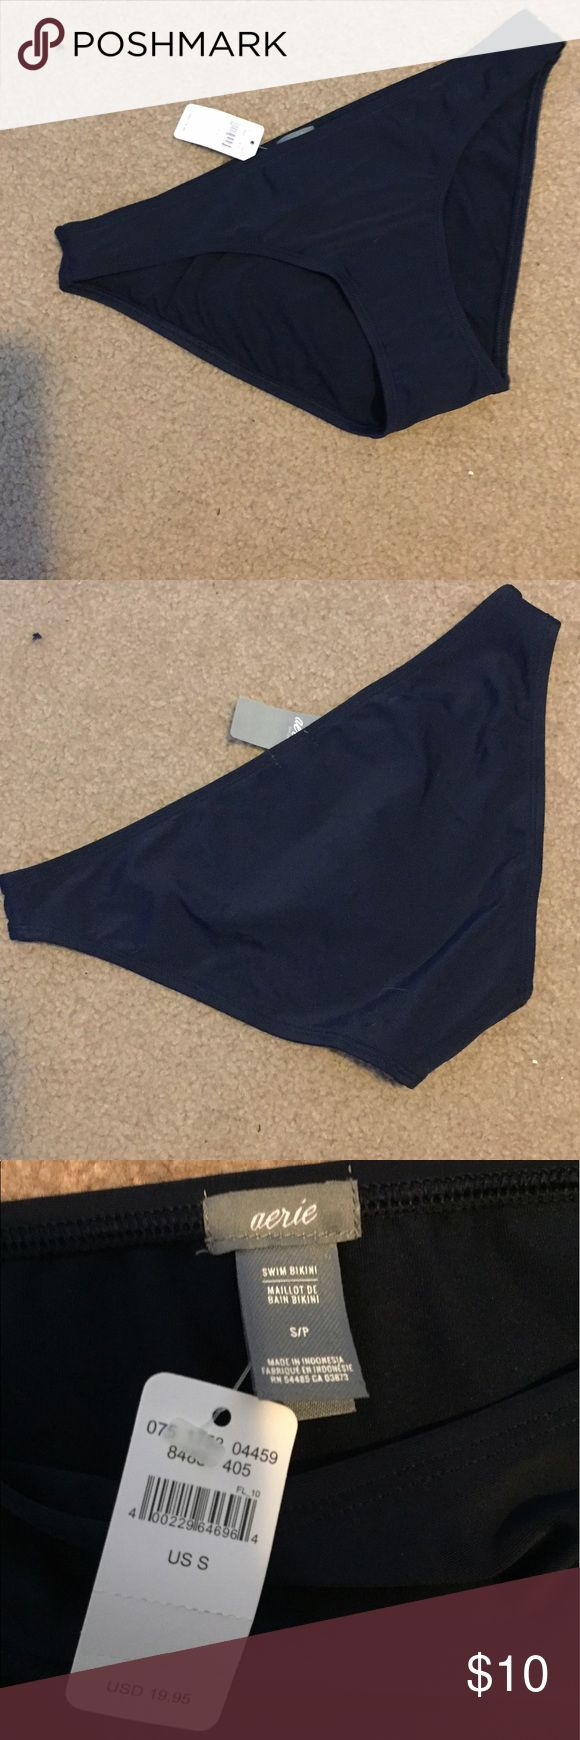 Navy blue bikini bottom Navy blue aerie bottom. Regular bikini cut. No frills. Just straight up navy blue bottoms. Would match s wide variety of tops! Never even tried them on. aerie Swim Bikinis